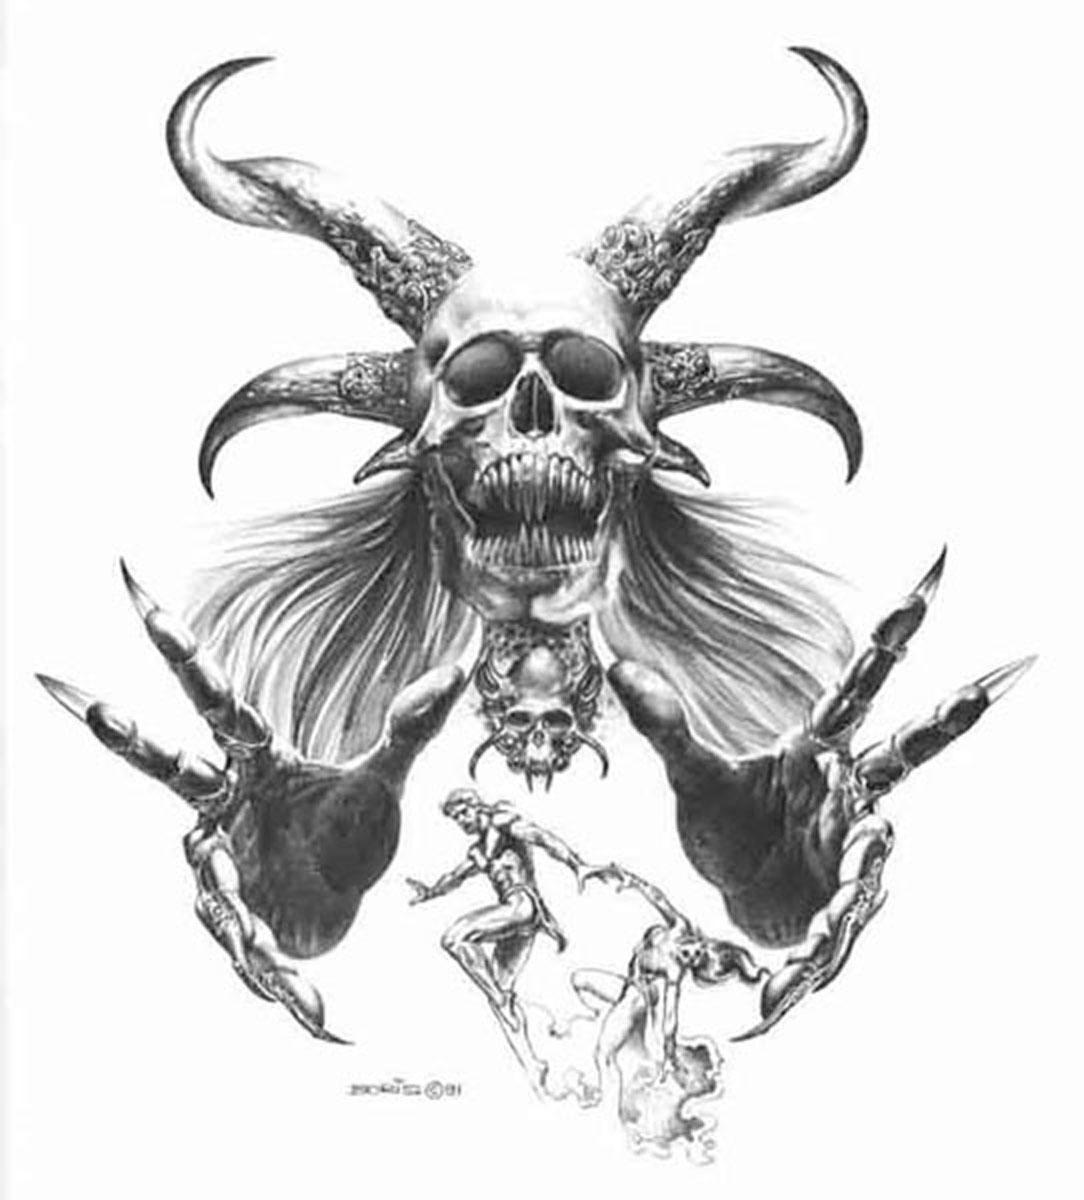 Satanic Tattoo: The Strange Case Of The Jihadi With A Satanic Tattoo